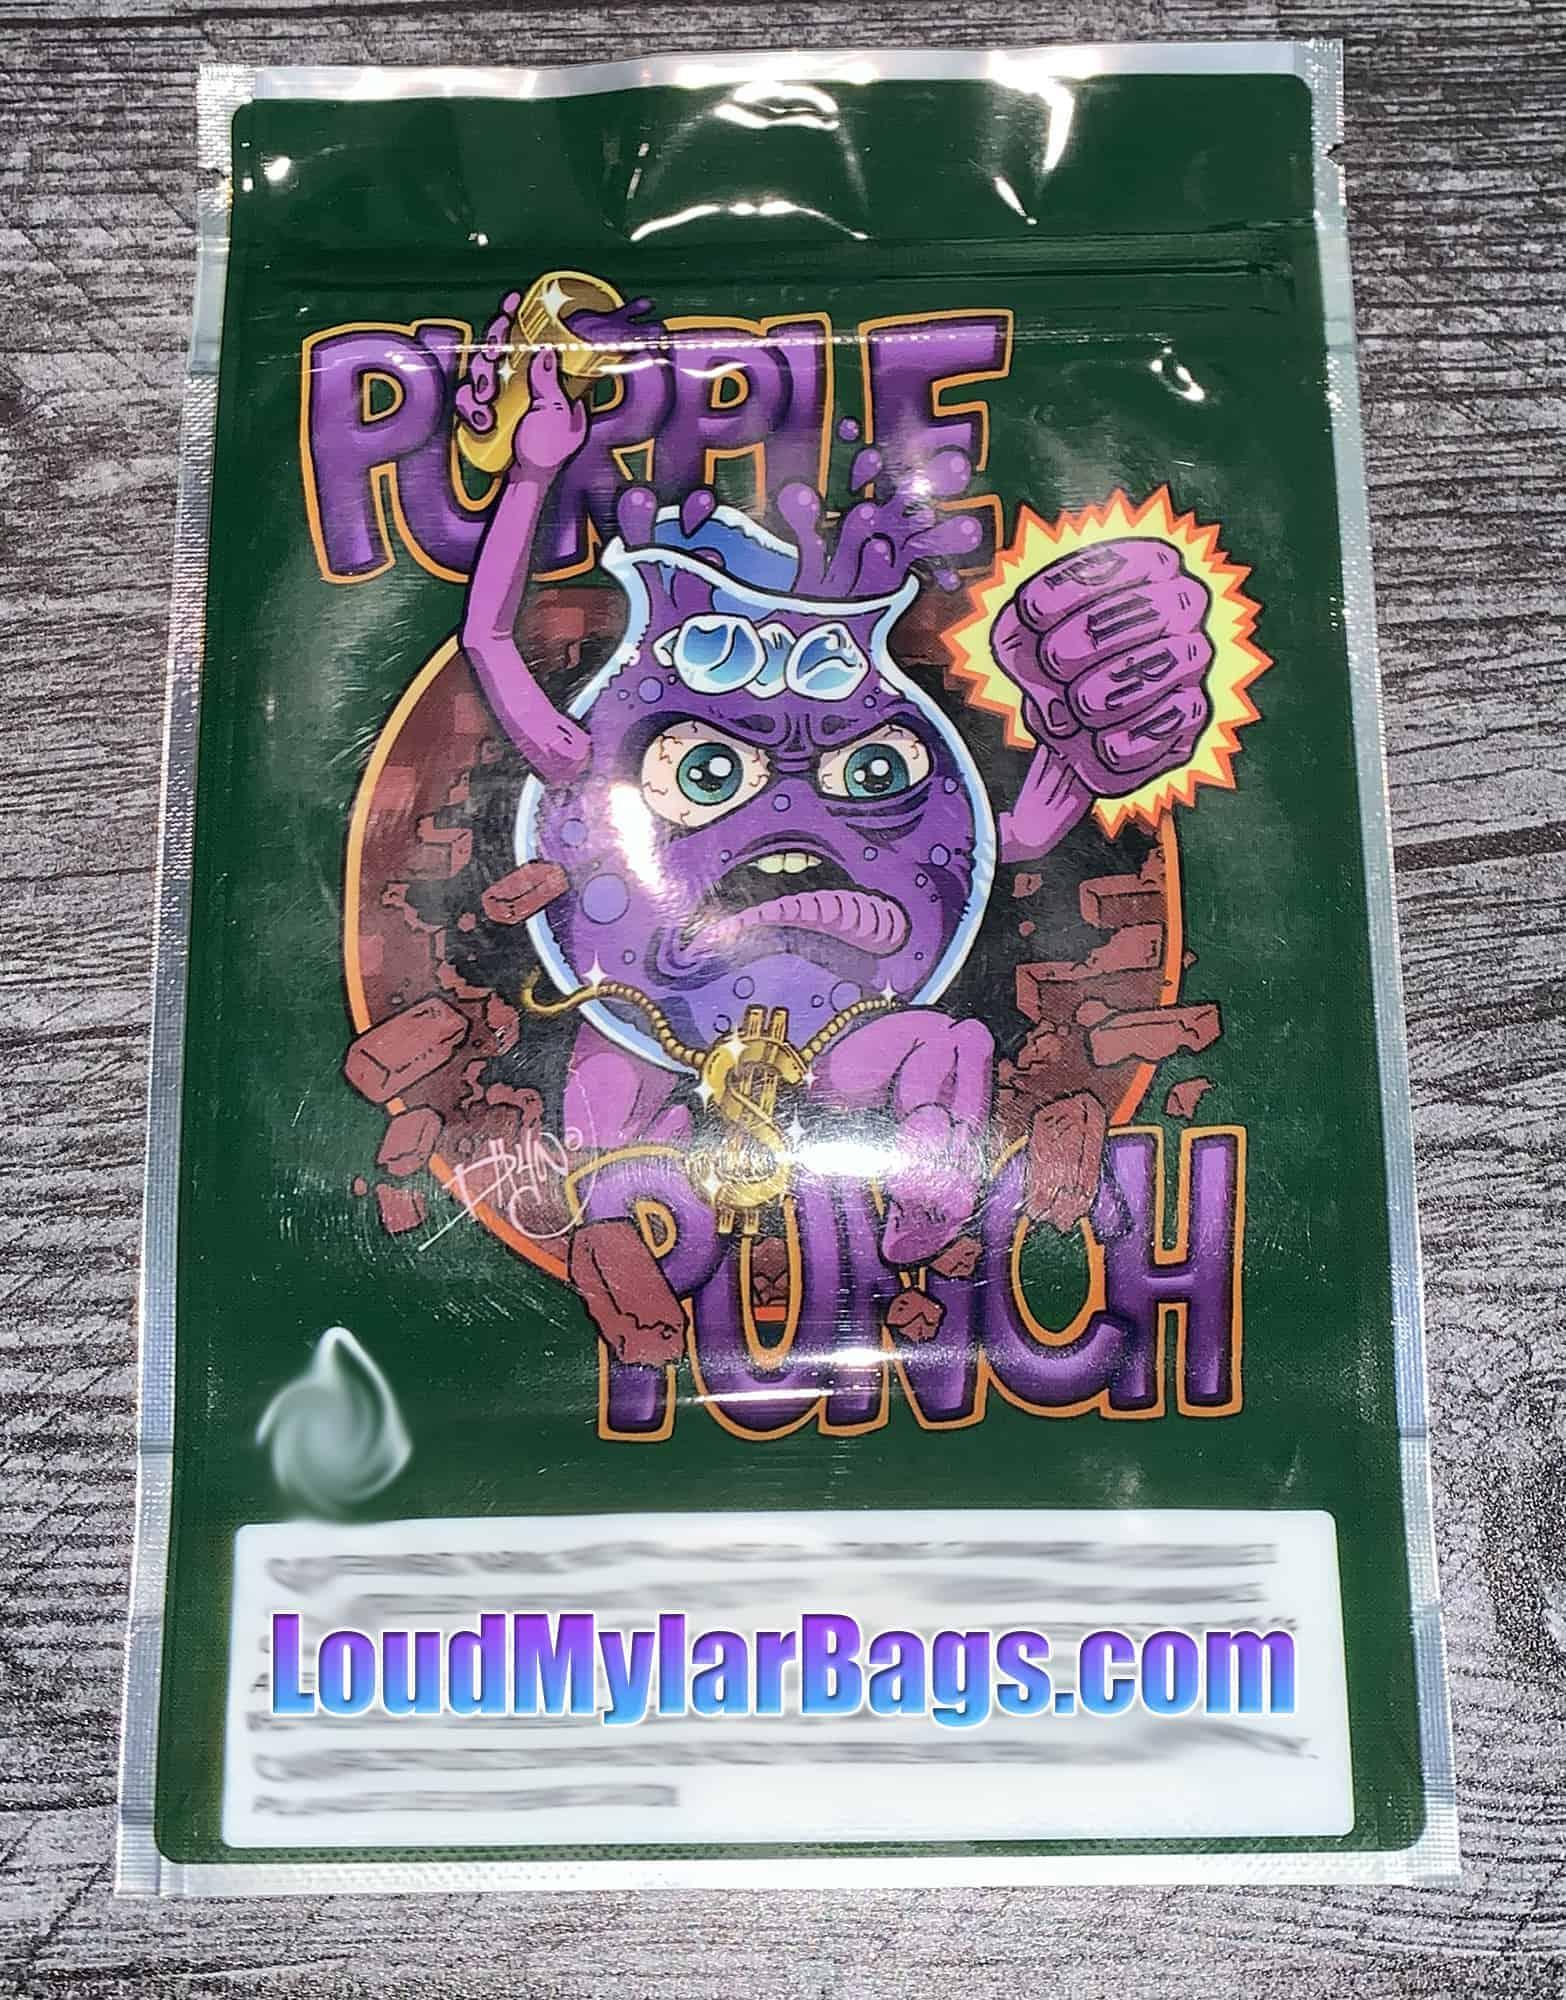 Empty Smell-Proof Mylar Bags Purple Alien OG 7g 30 Bags